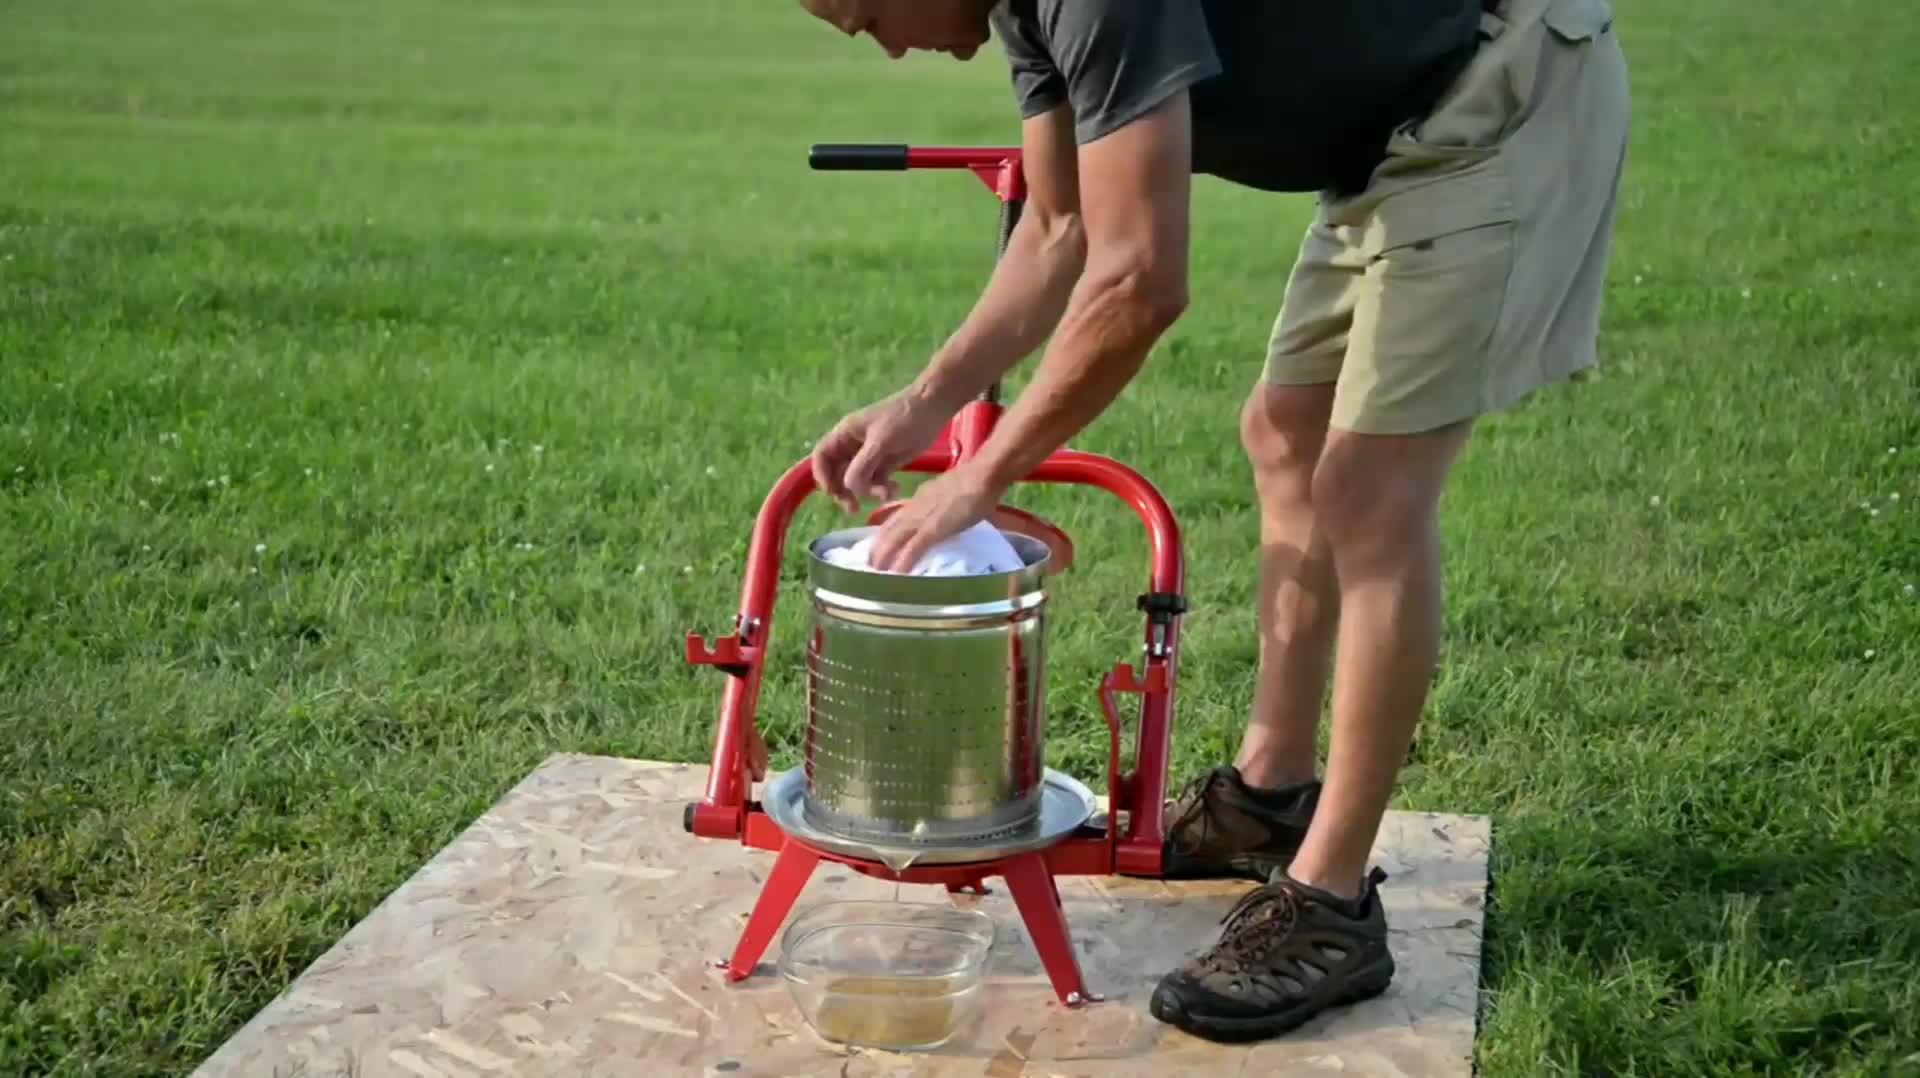 Hot sales Manual MacIntosh Apple Cider Druk Juicer Machine